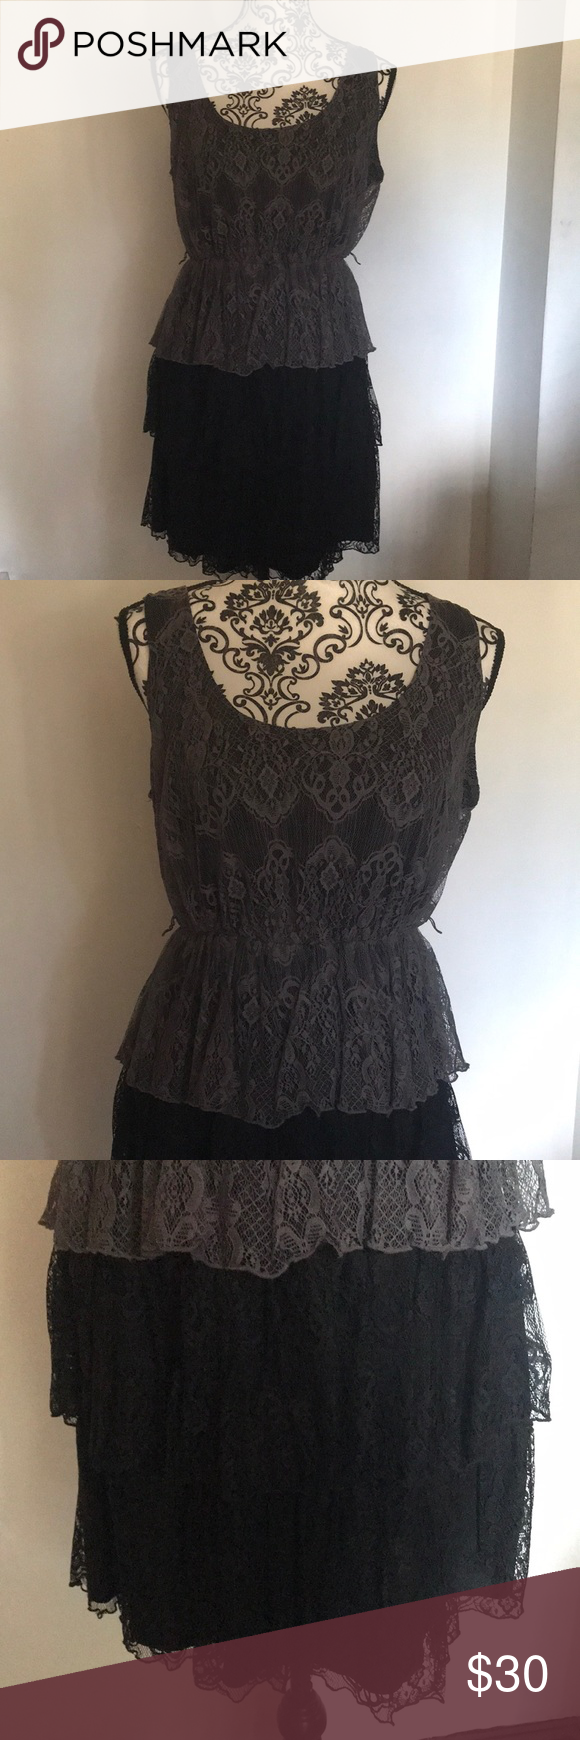 New black u gray ruffled dress boutique black ruffle ruffle dress